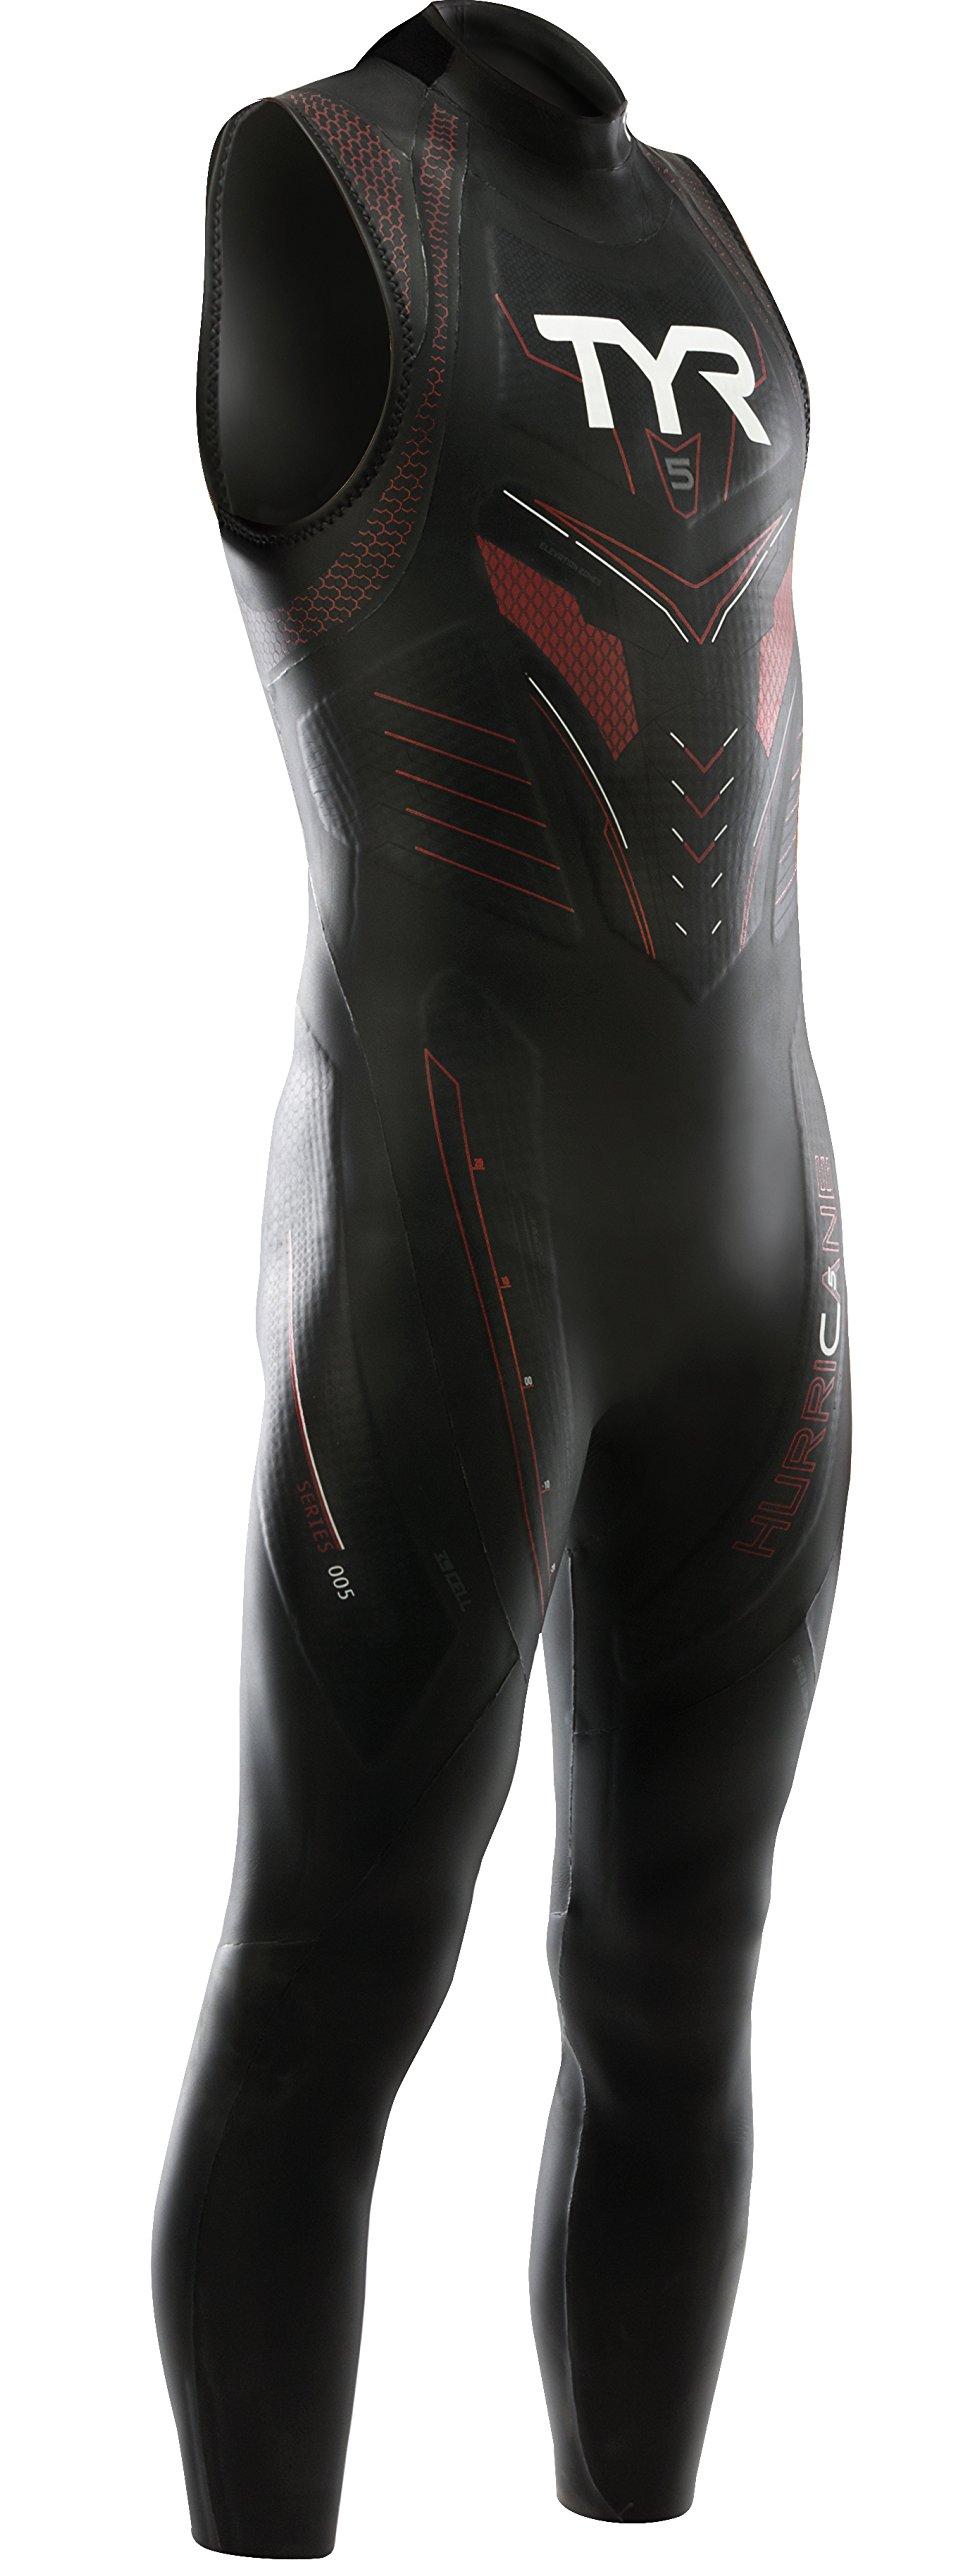 TYR Sport Men's Hurricane Sleeveless Wetsuit Category 5, Black/Red, X-Small